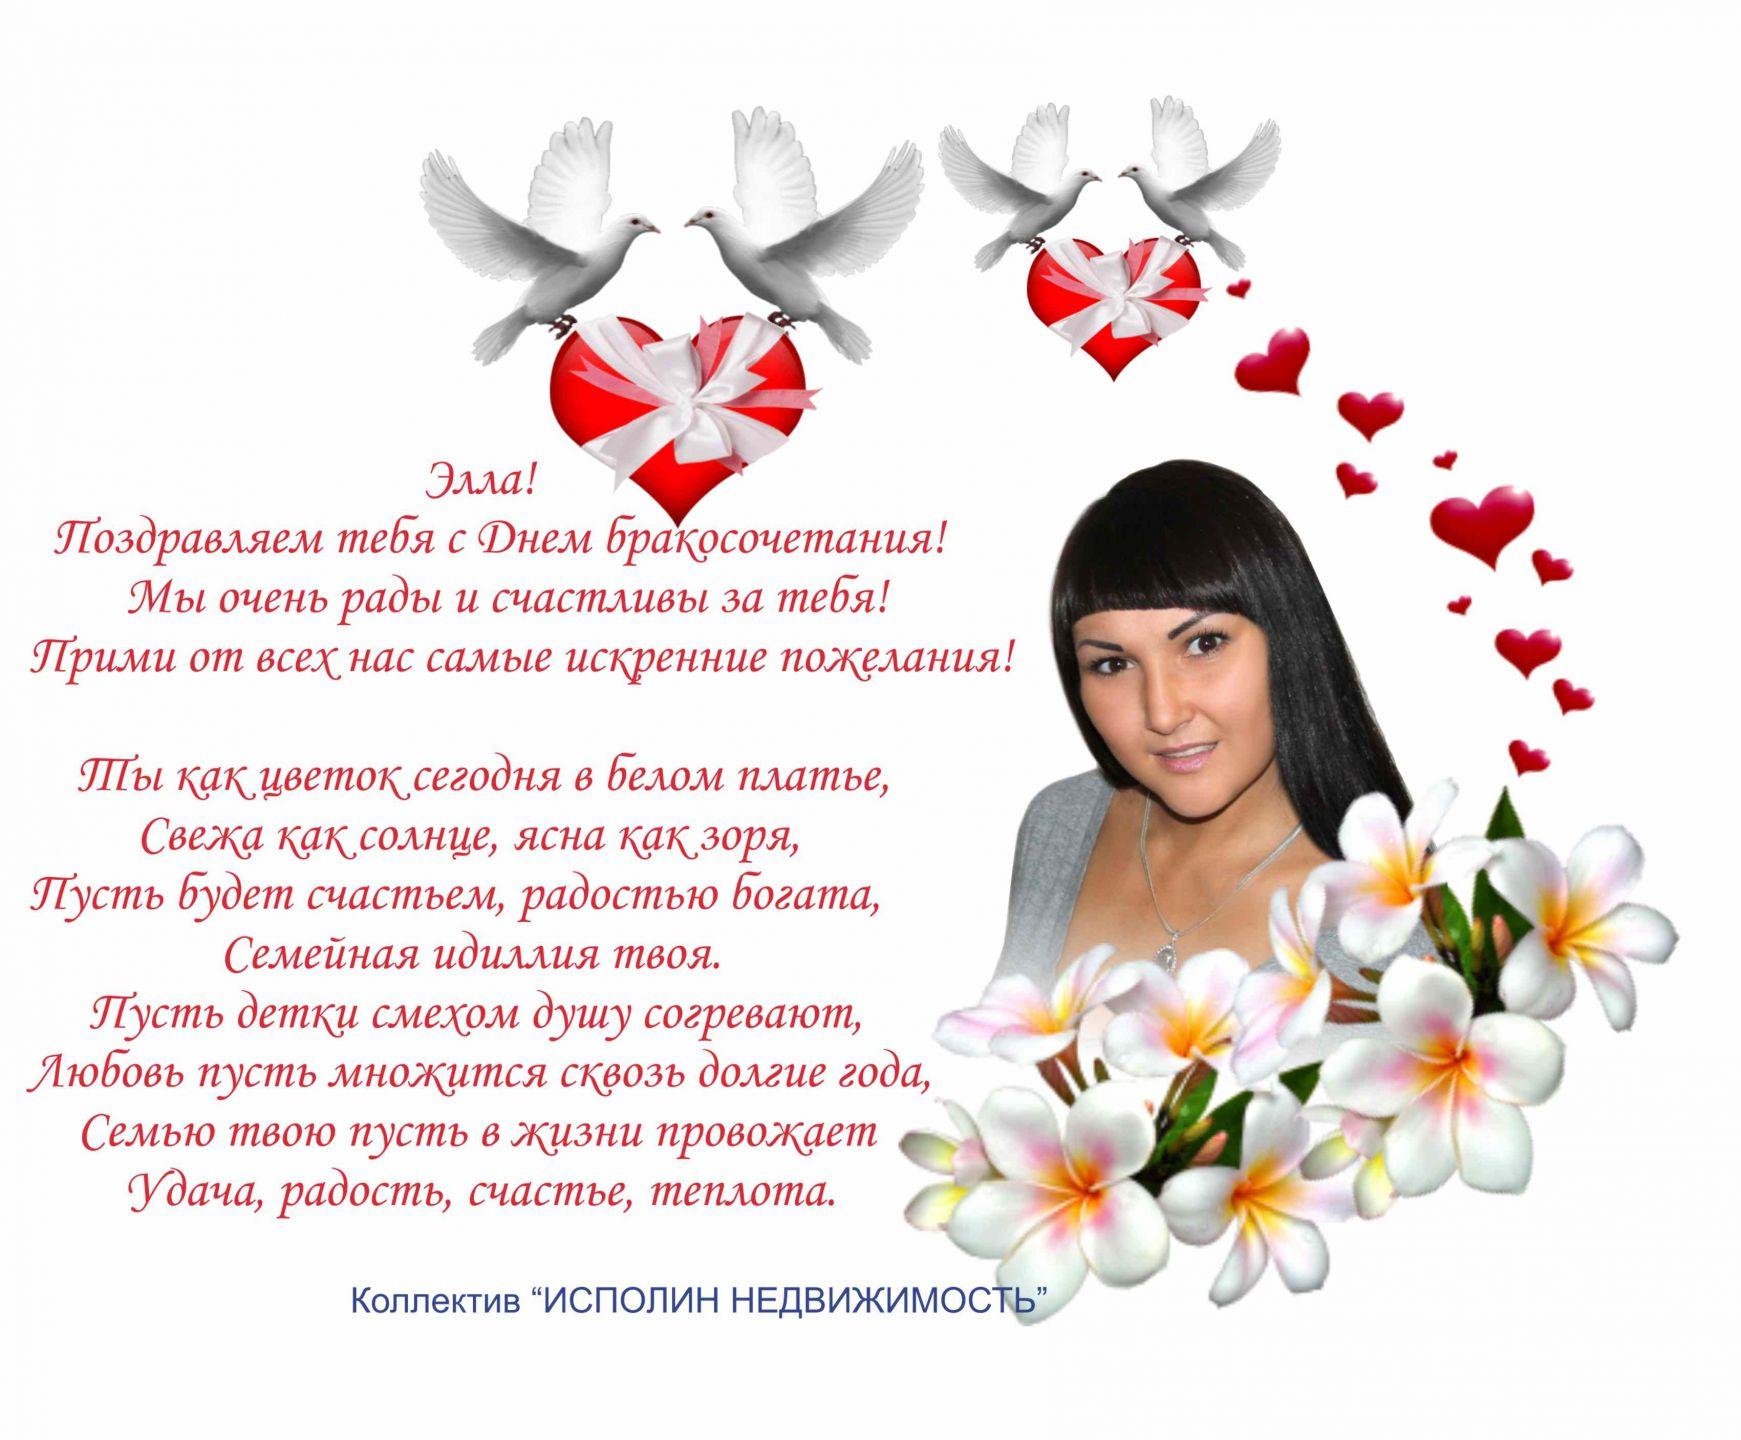 Поздравление на свадьбу от коллектива в стихах 29